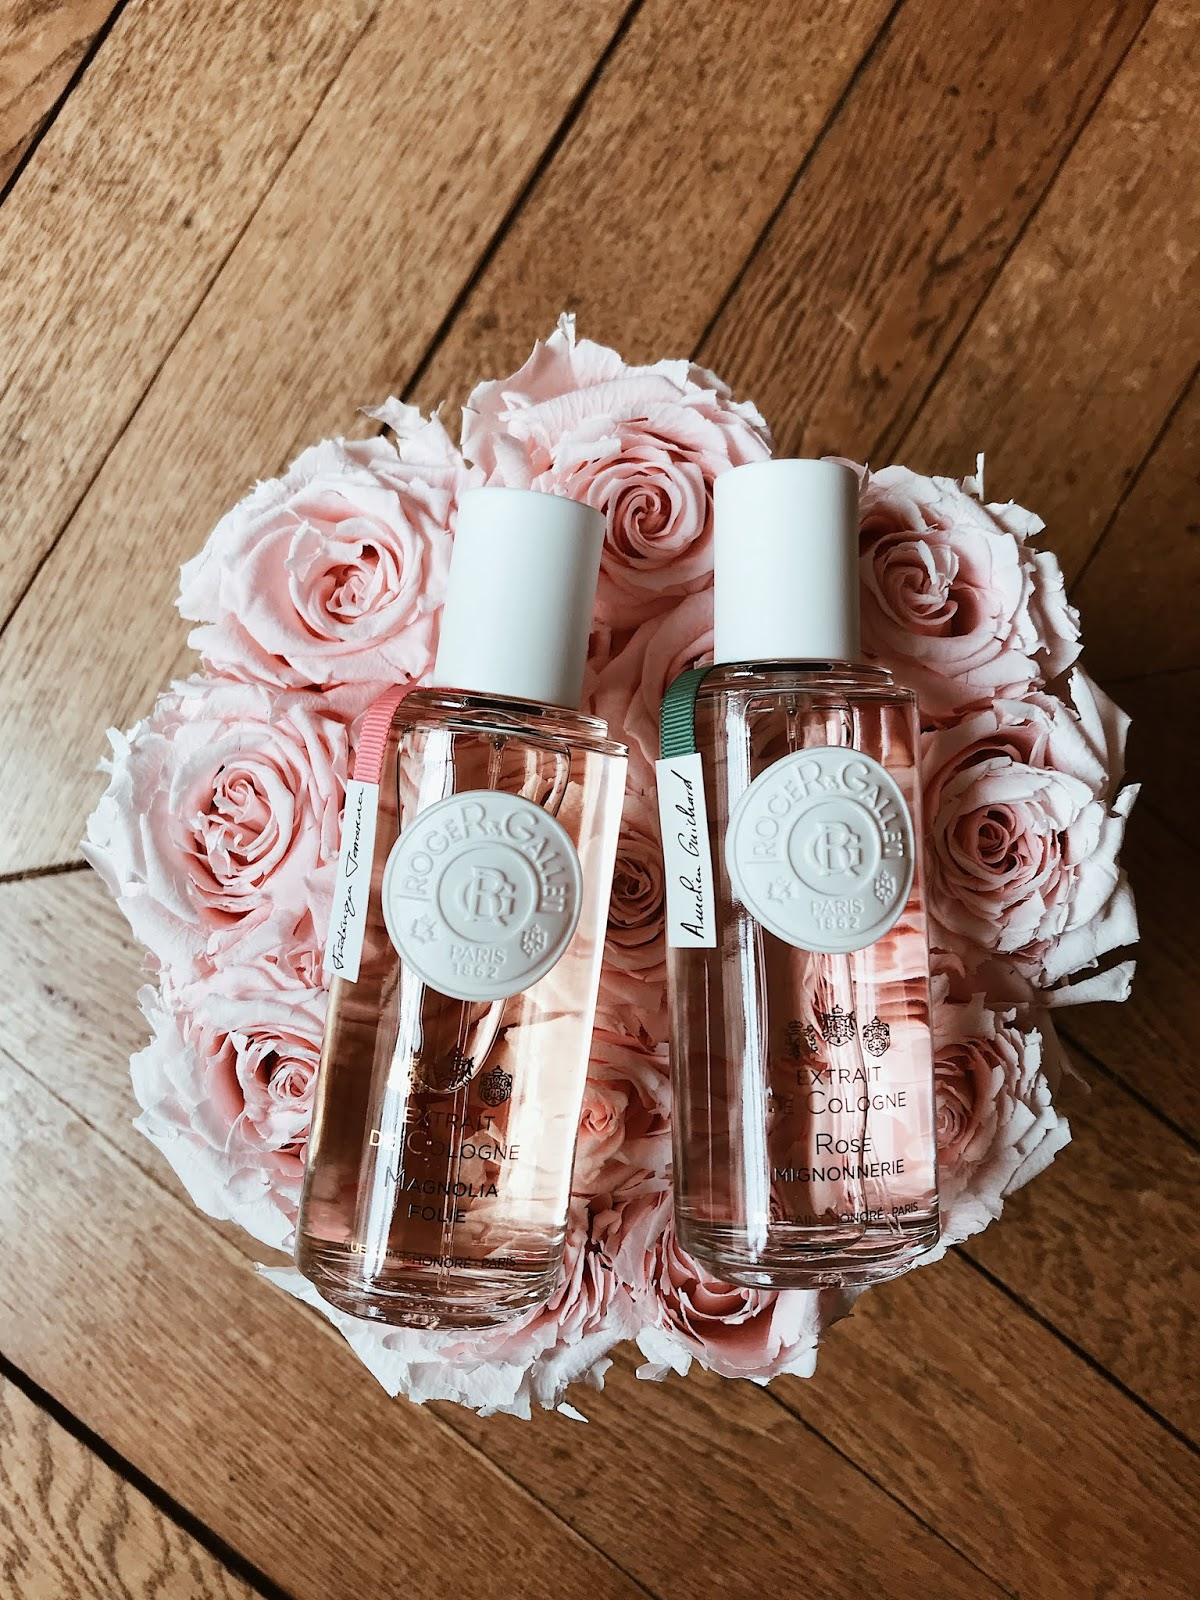 Roger Gallet Et Ses Champs De Roses They Call Me Mellie